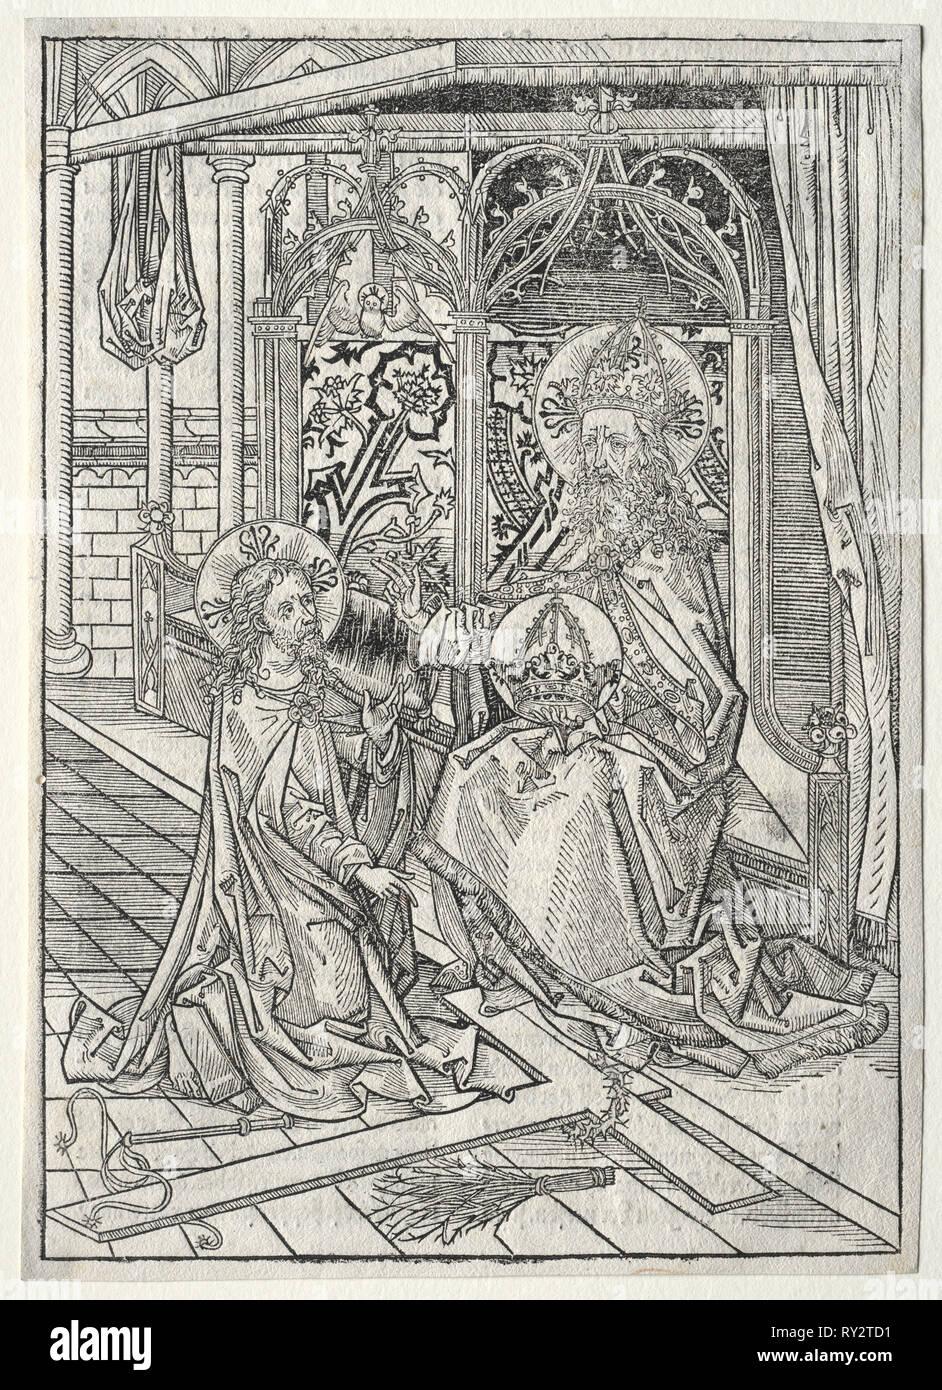 Der Schatzbehalter:  The Trinity, 1491. Michael Wolgemut (German, 1434-1519). Woodcut - Stock Image